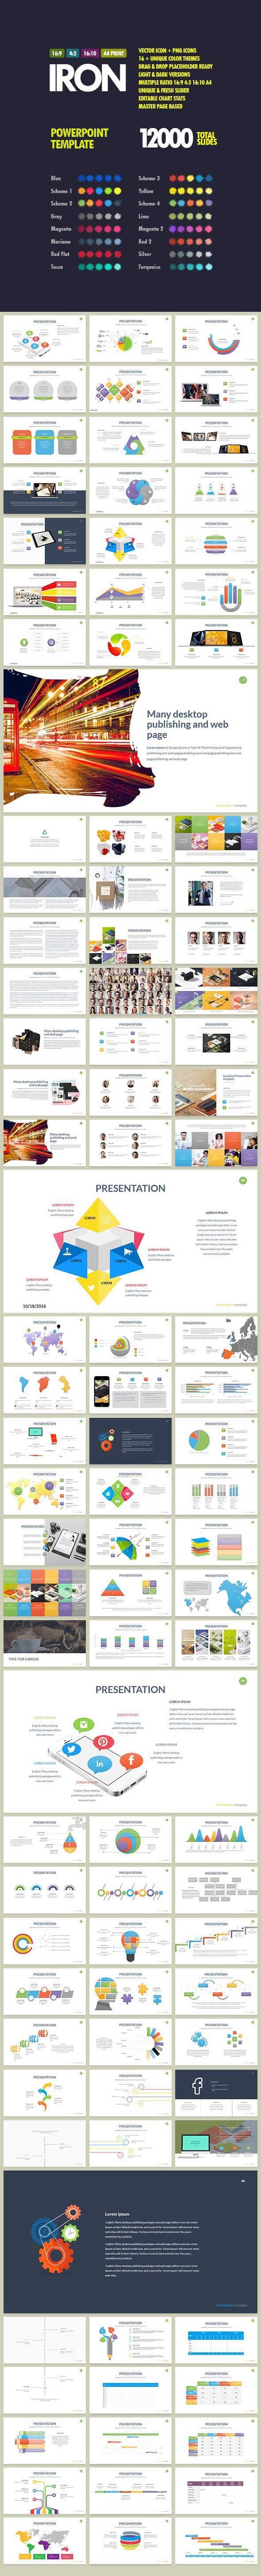 Iron Presentation Powerpoint — Powerpoint PPTX #creative #entrepreneur • Download ➝ https://graphicriver.net/item/iron-presentation-powerpoint/18813021?ref=pxcr